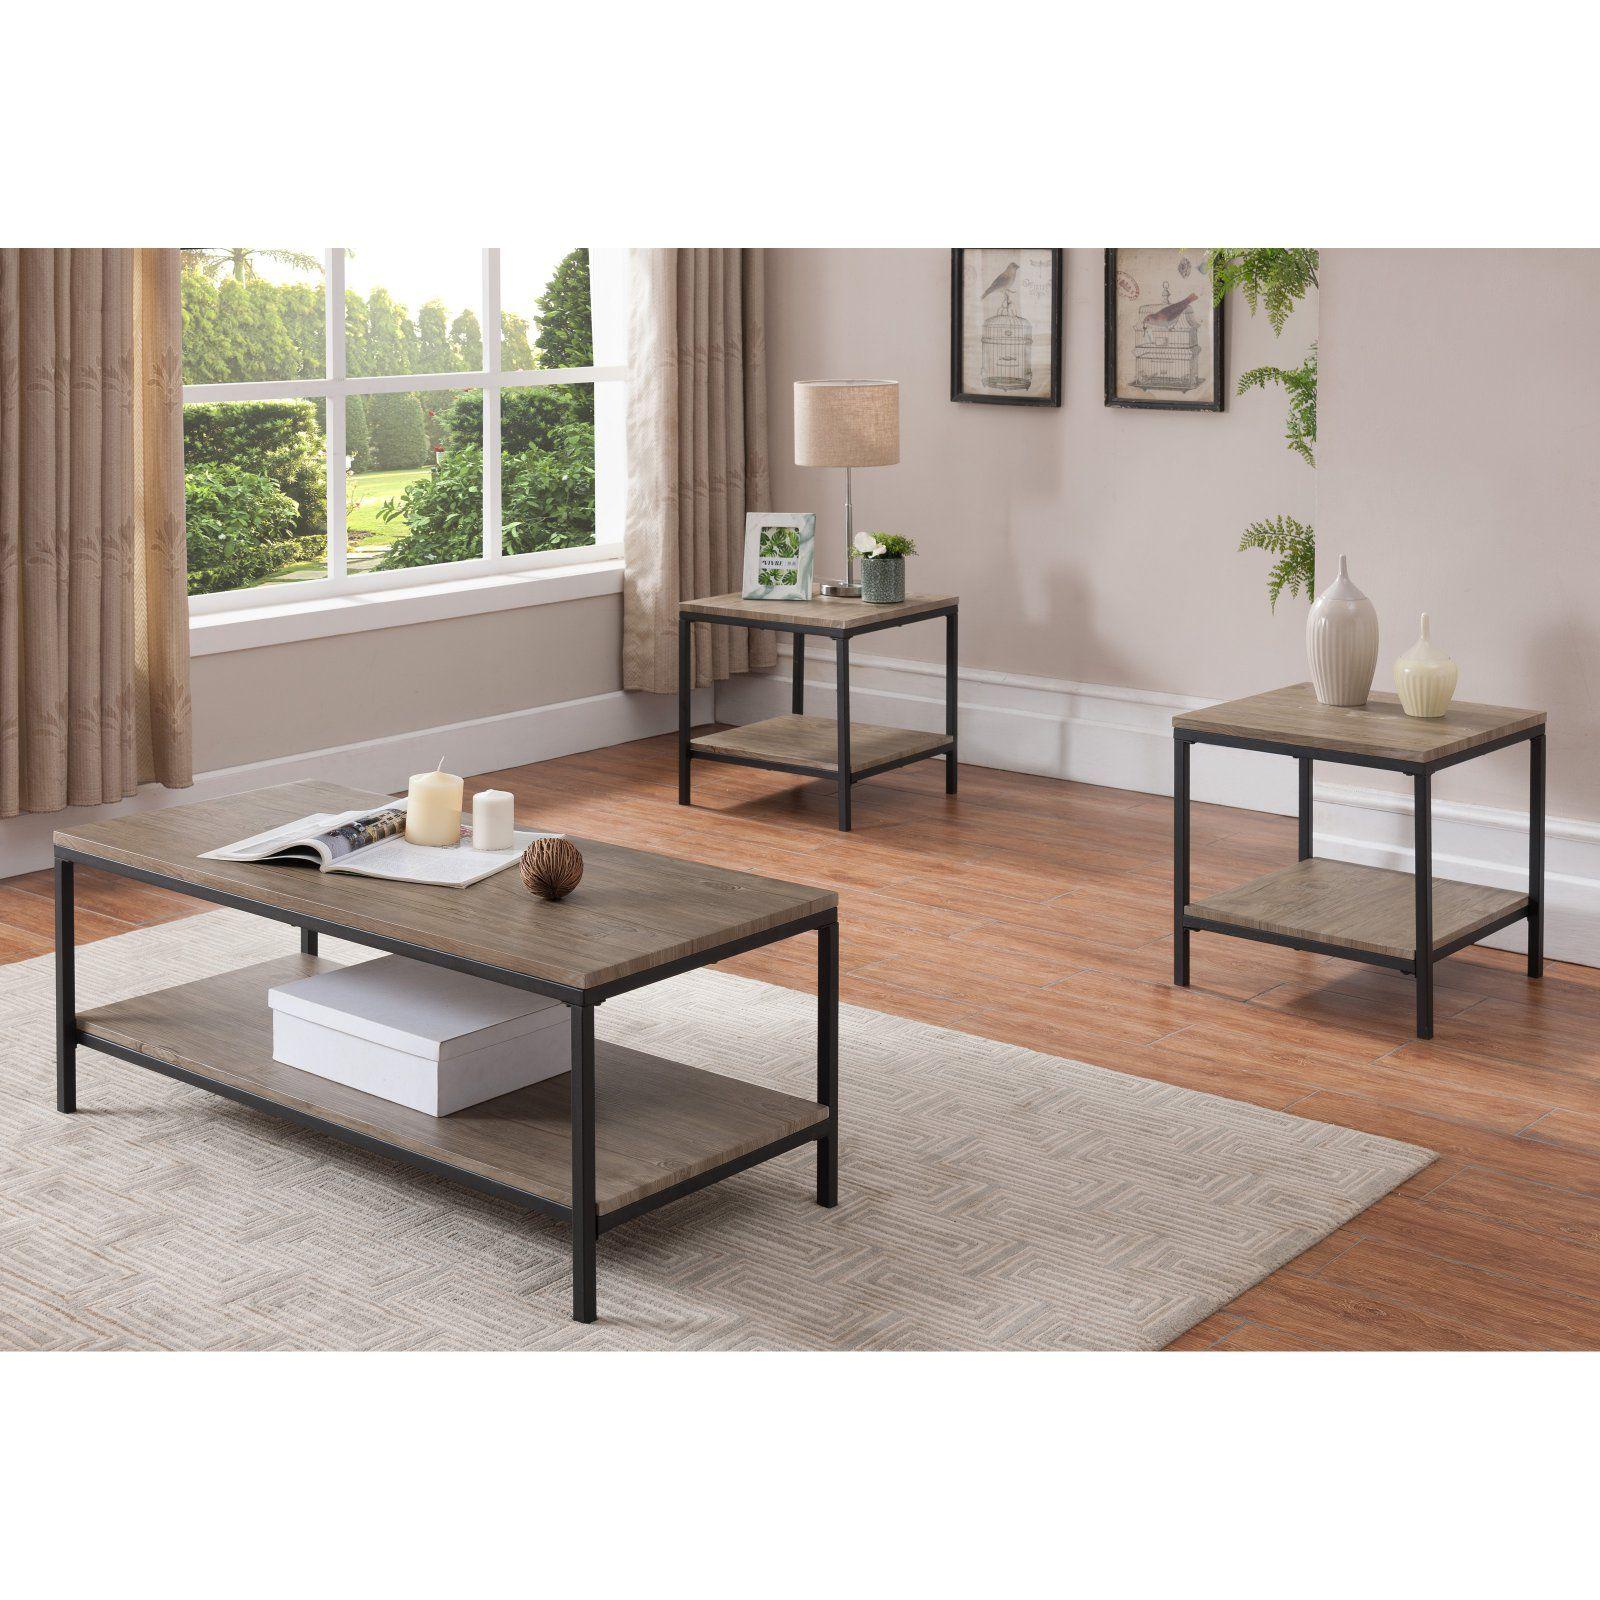 K B Furniture T1166 Wood Metal 3 Piece Coffee Table Set 3 Piece